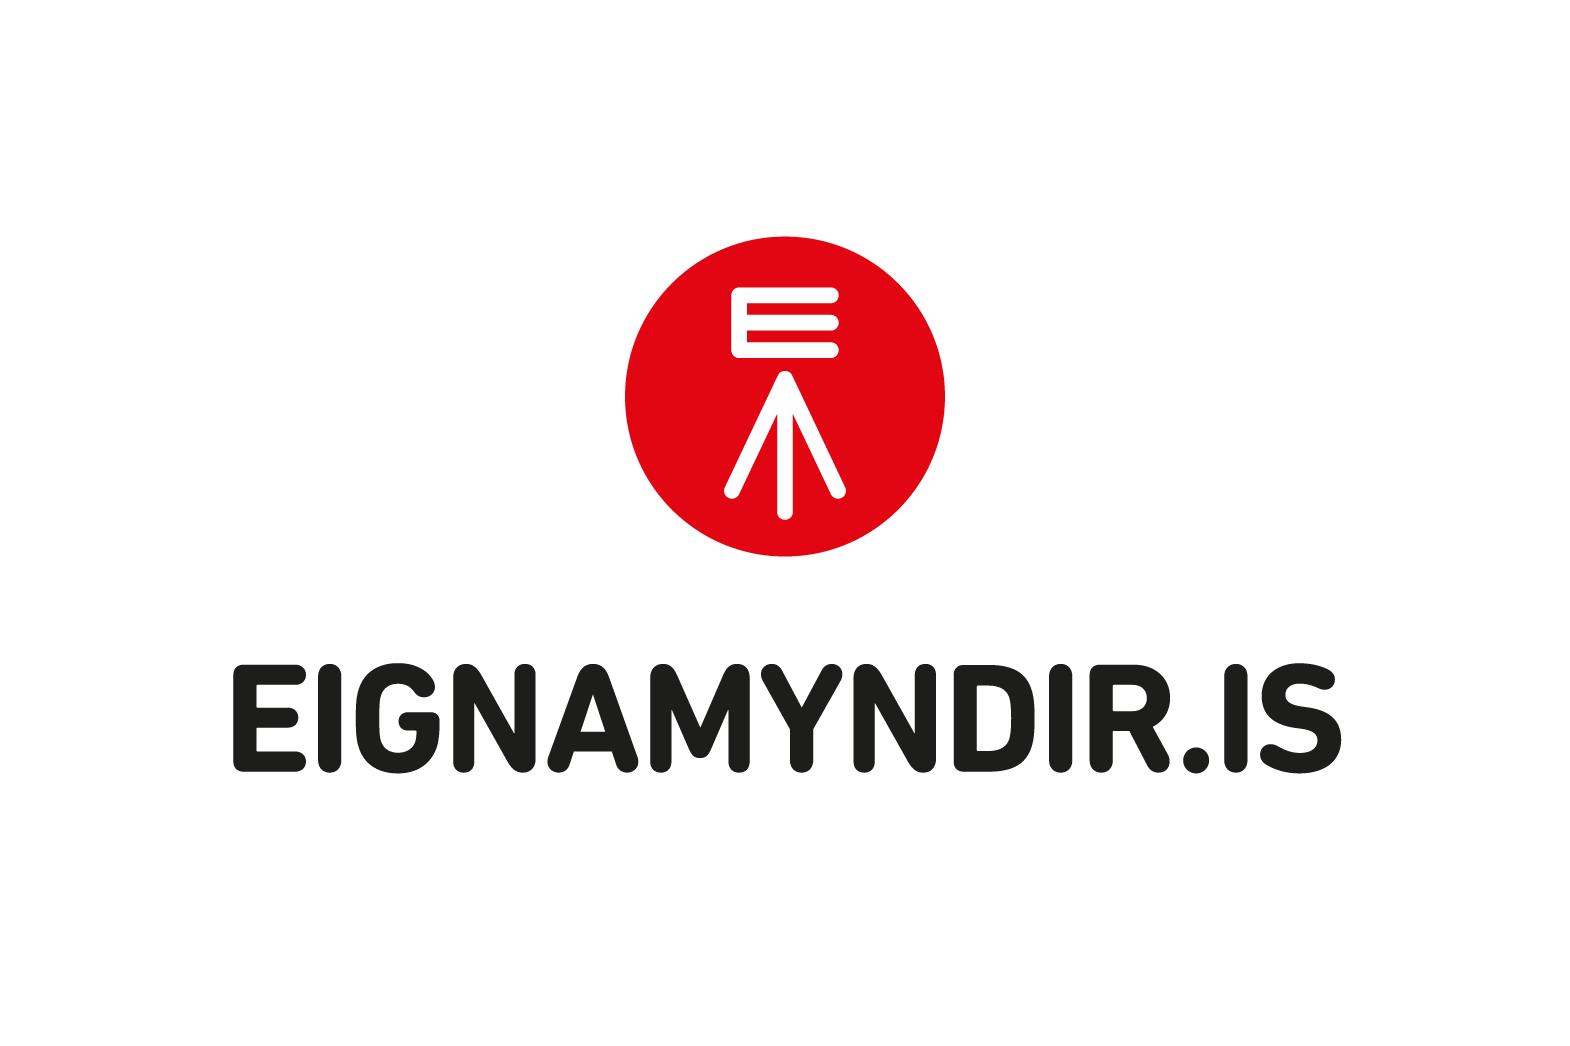 Eignamyndir.is